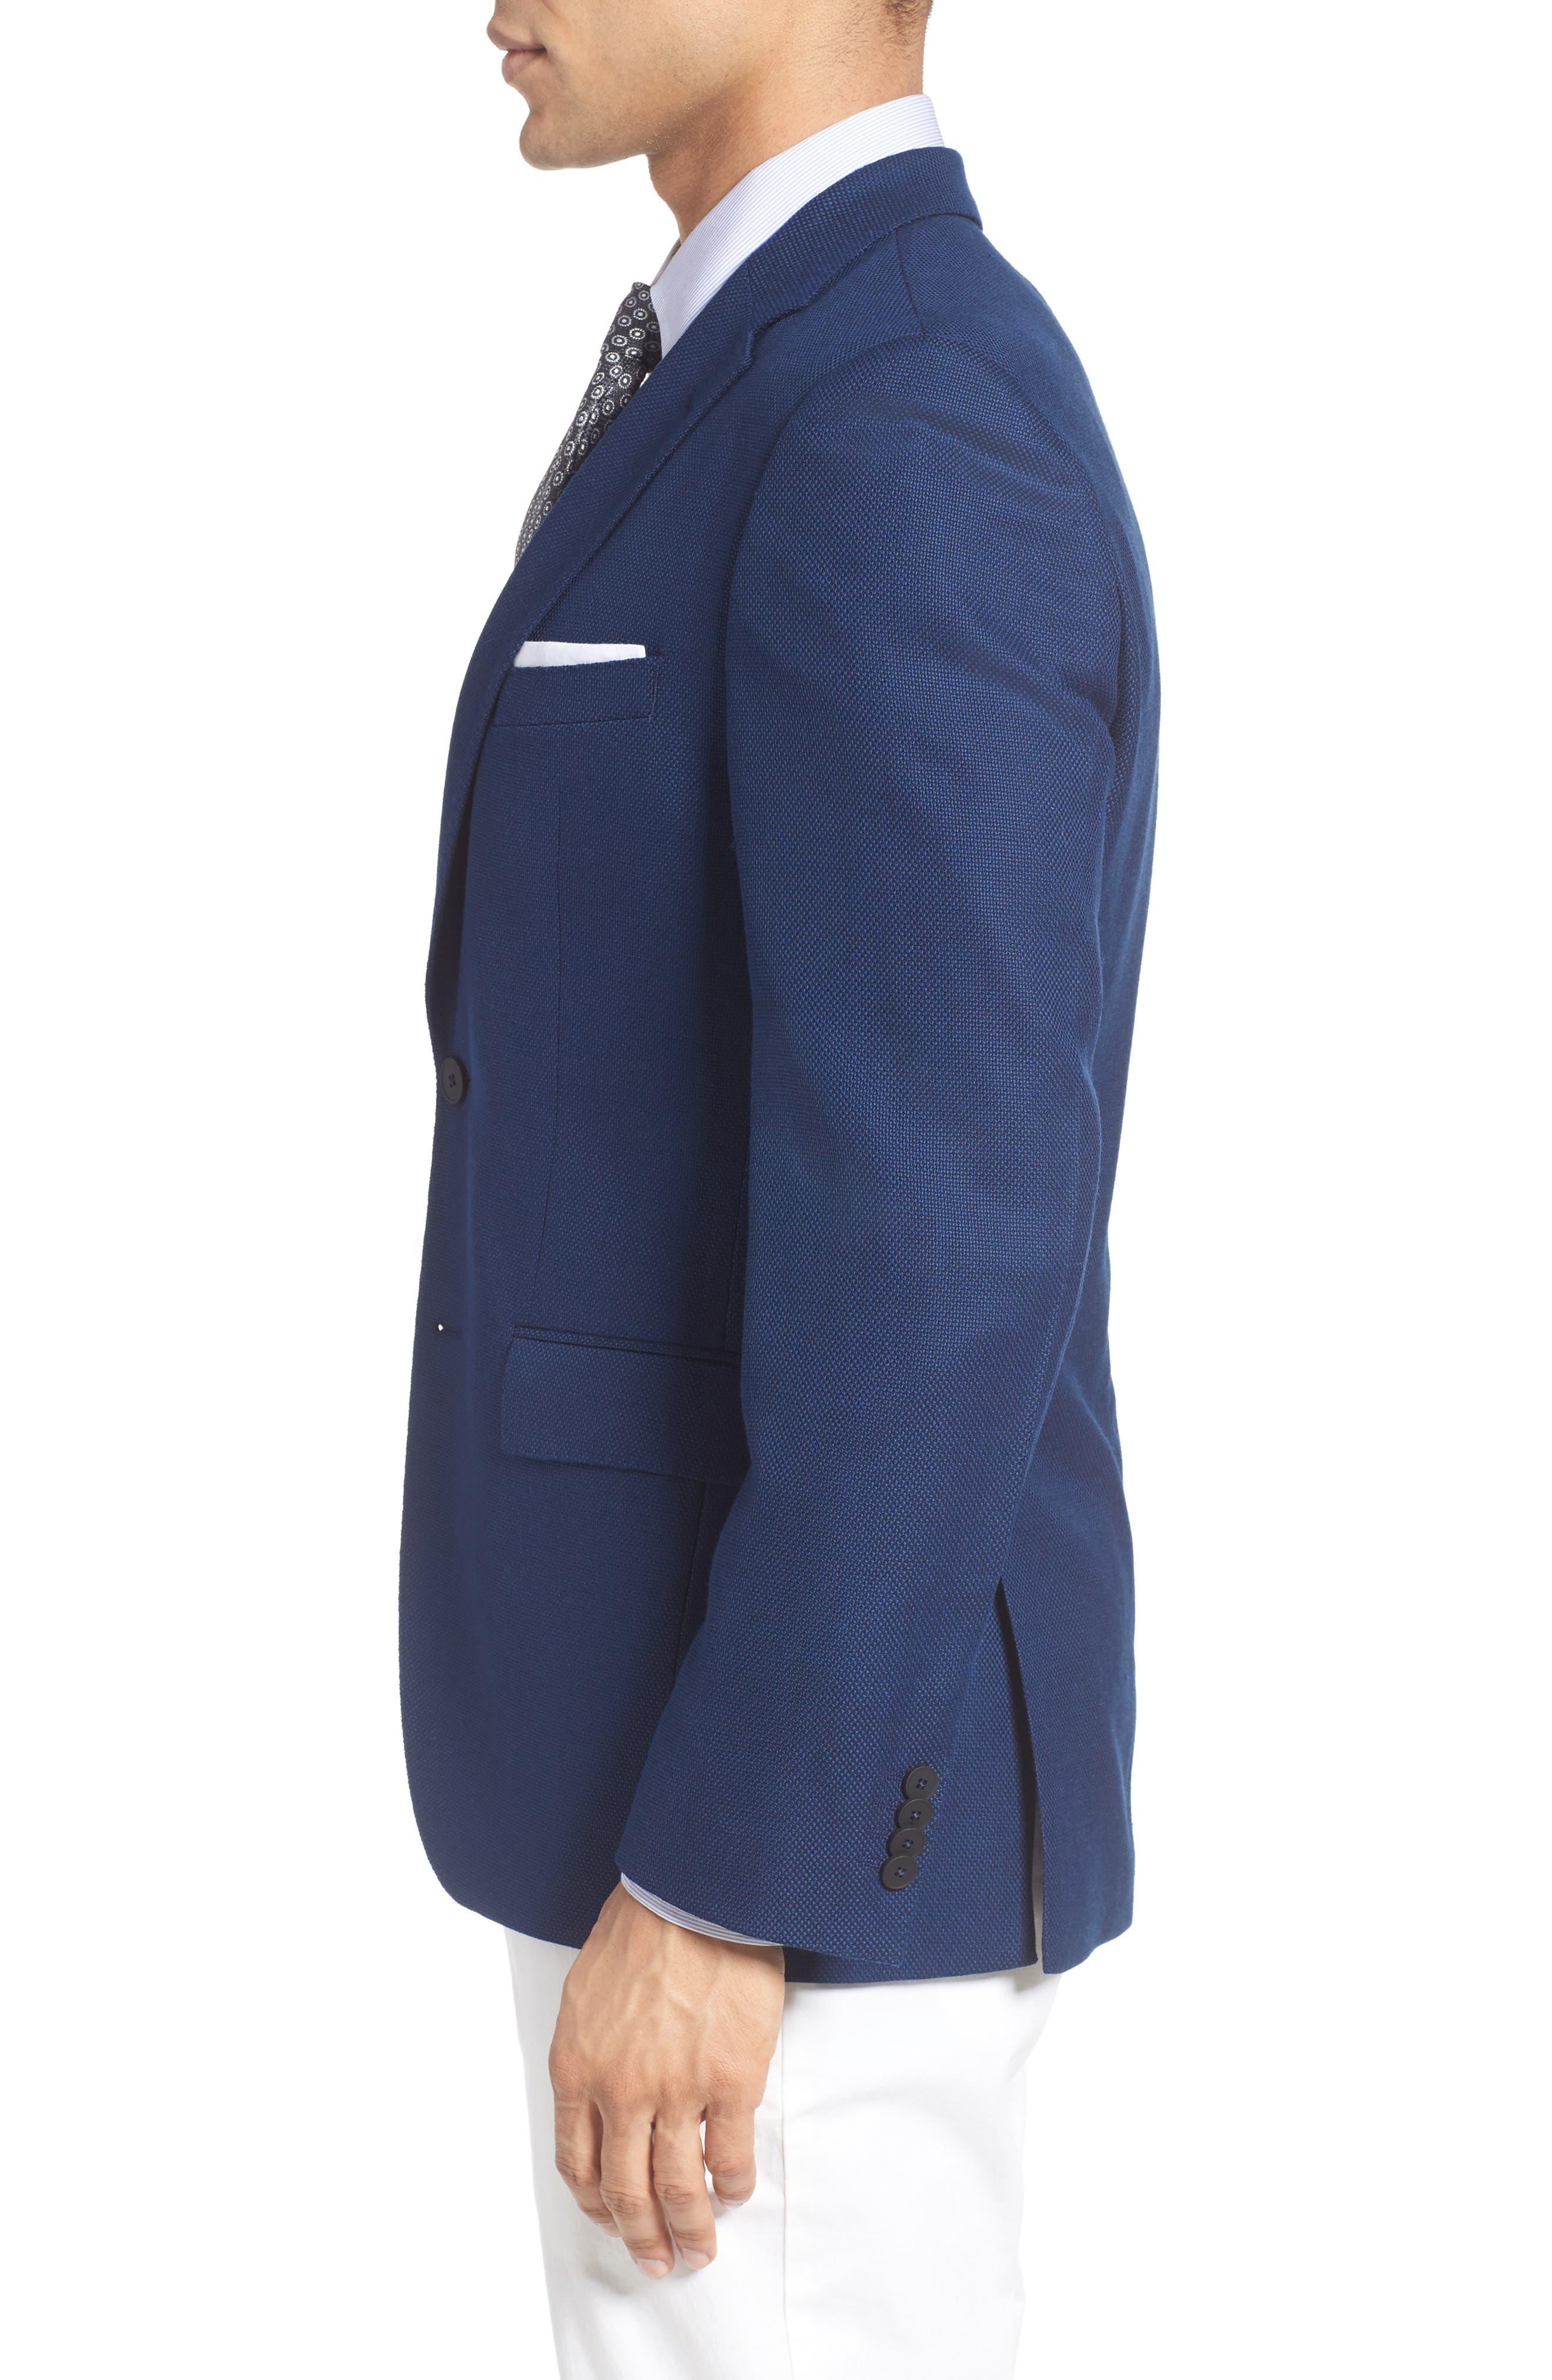 ZZDNUHUGO BOSS,                             BOSS Jet Trim Fit Stretch Wool Travel Blazer,                             Alternate thumbnail 3, color,                             420